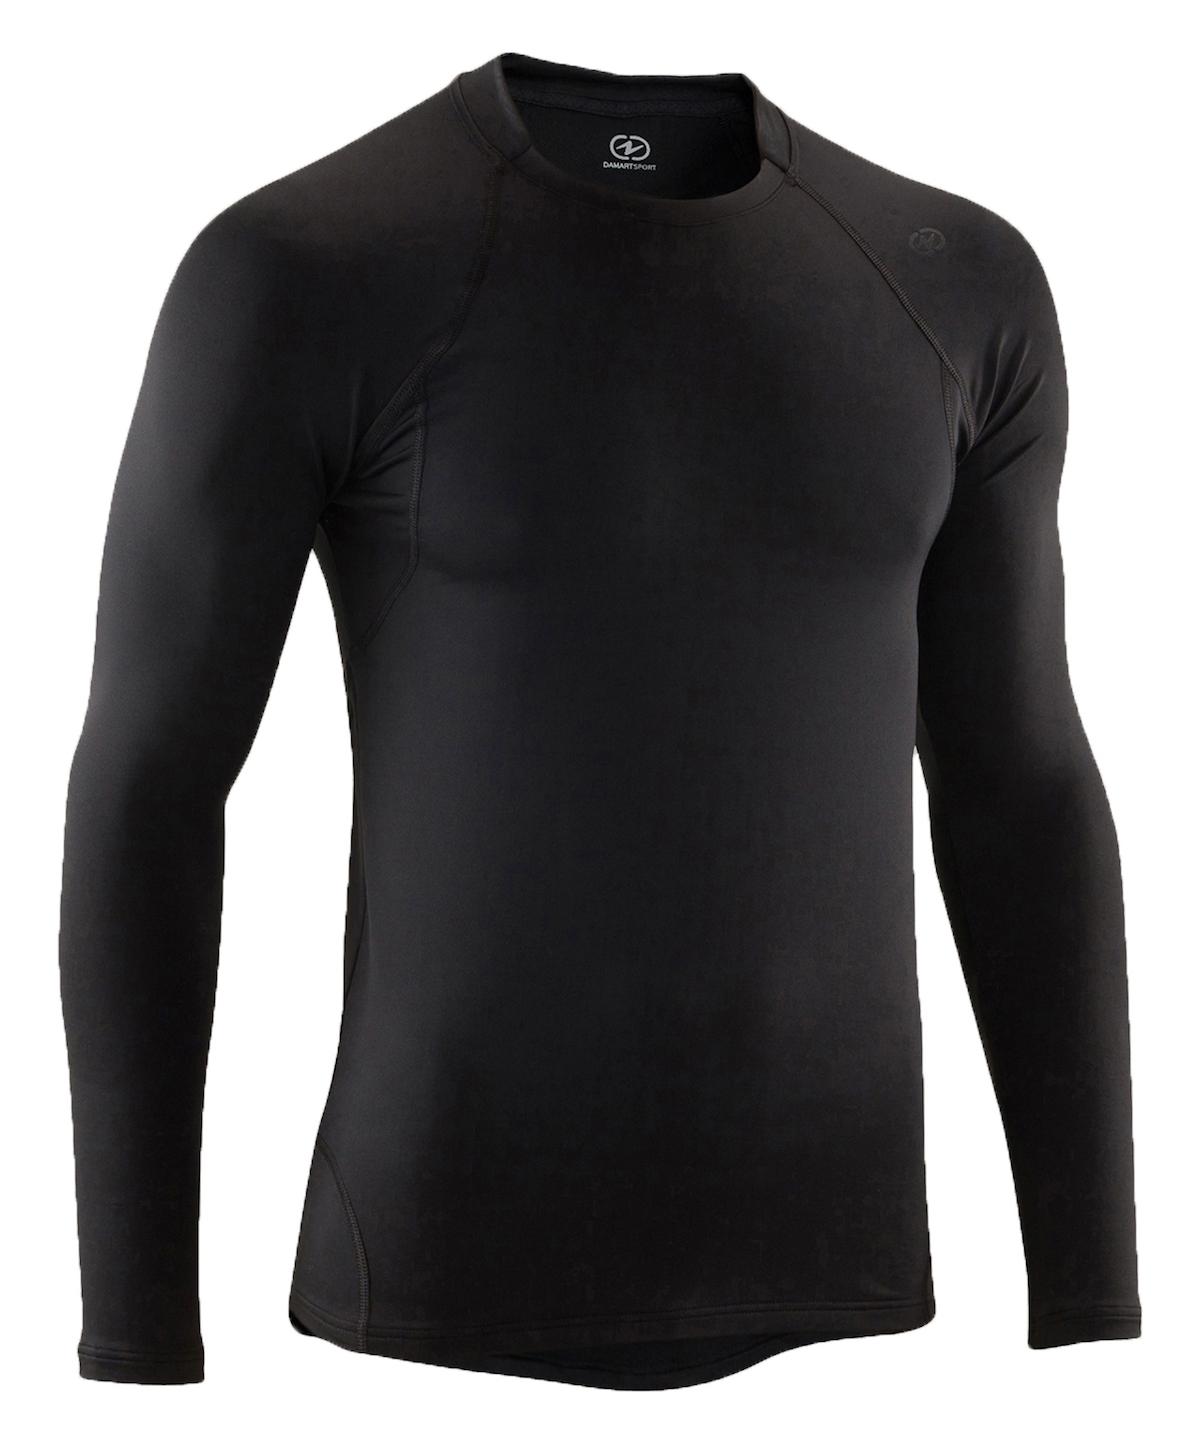 Damart Sport Easy Body 3 - T-Shirt - Herren